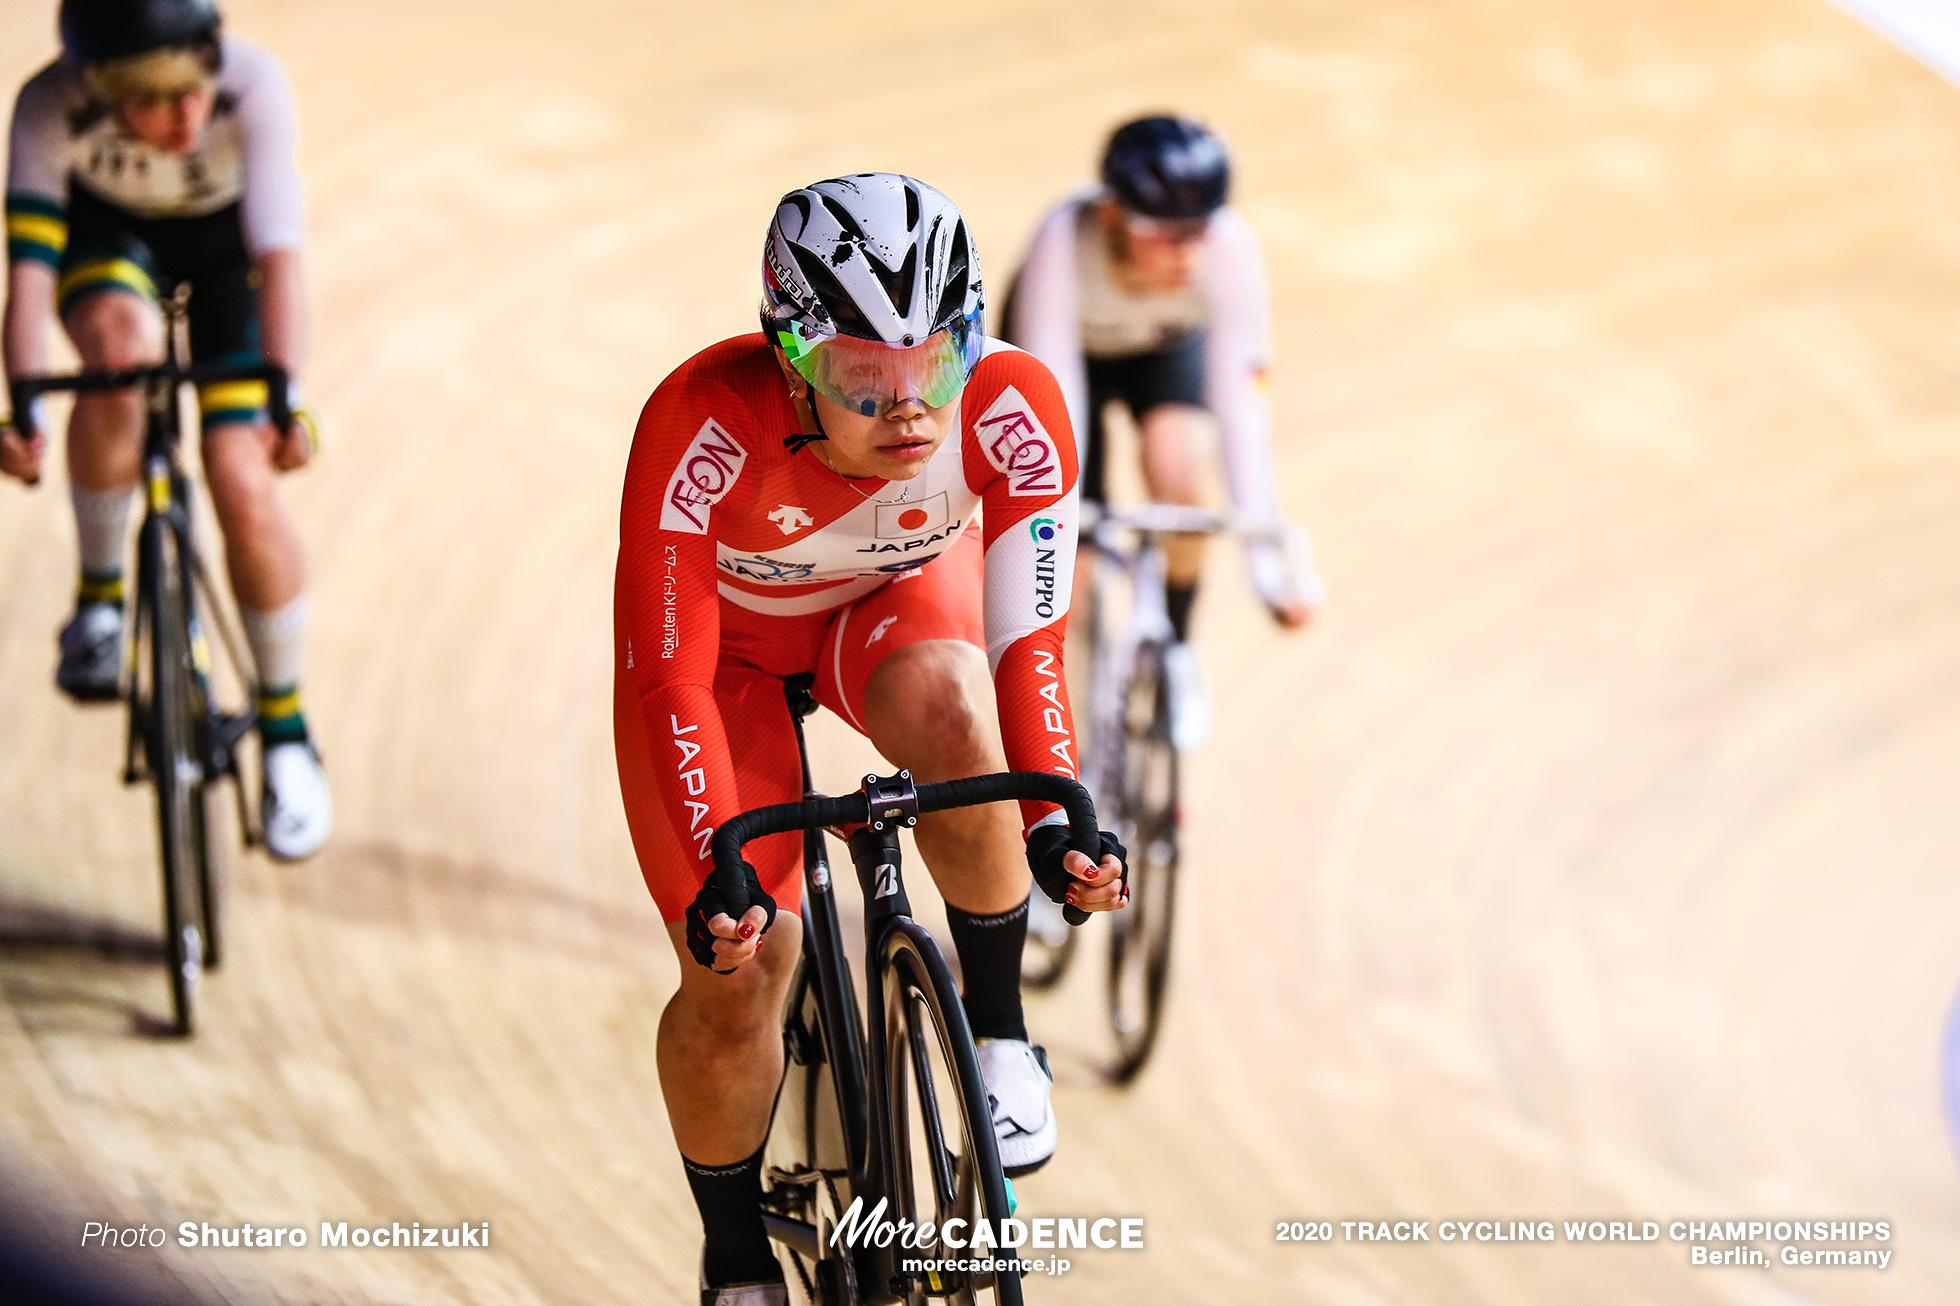 Women's Scratch / 2020 Track Cycling World Championships, 古山稀絵 Furuyama Kie